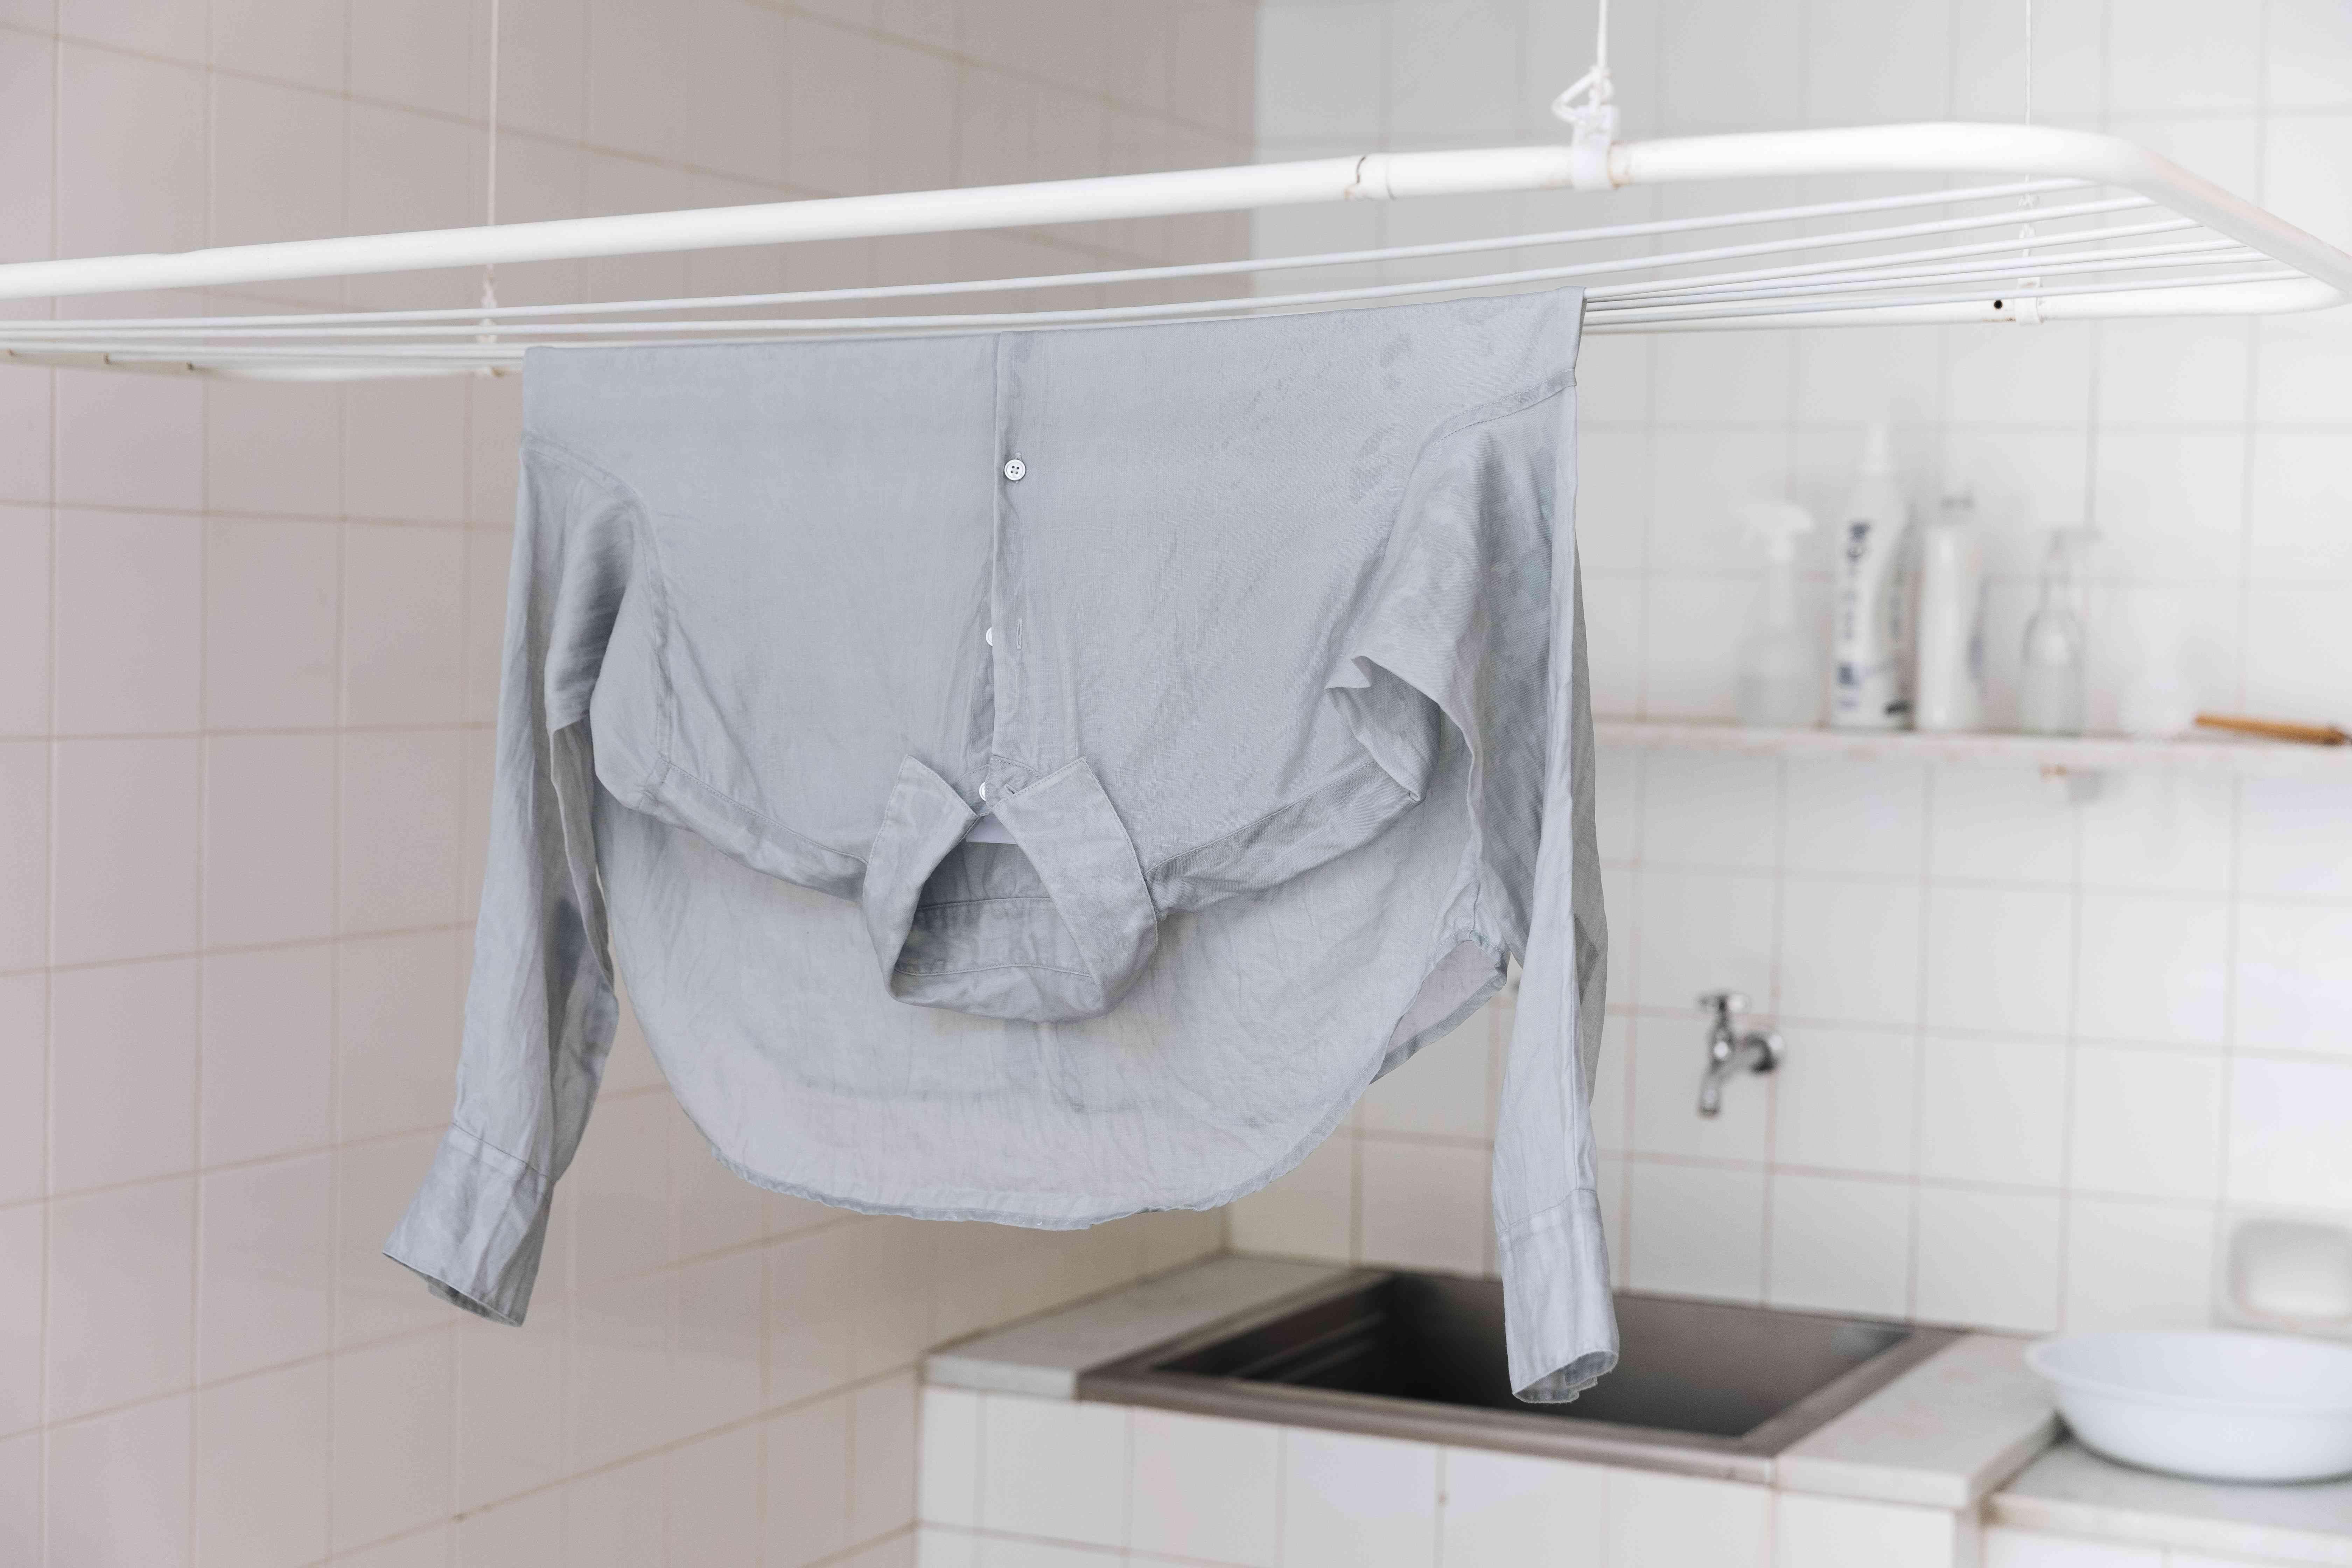 air-drying linen clothing